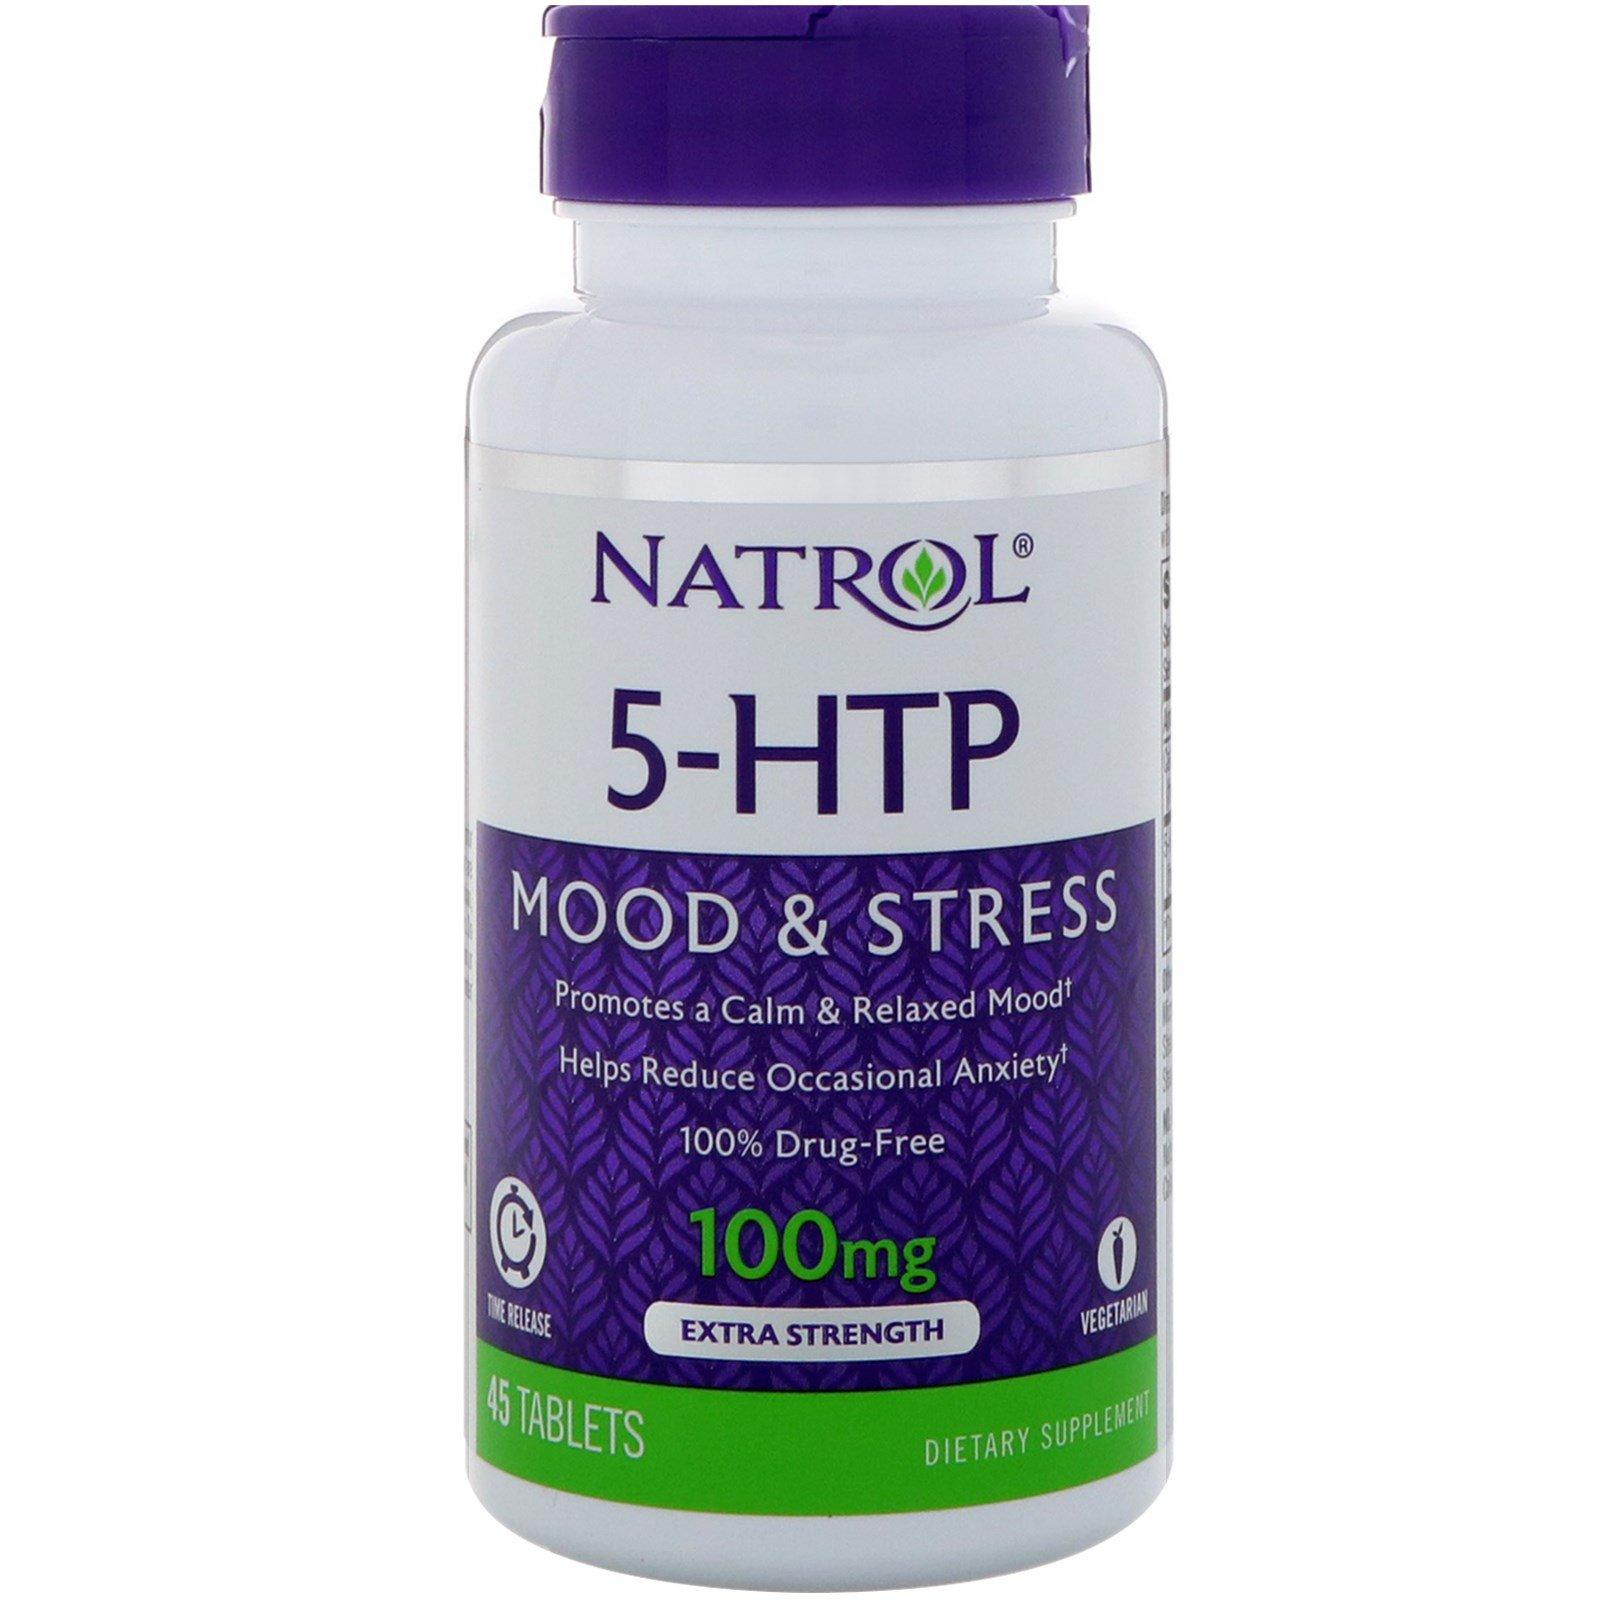 Natrol® 5-htp mood relaxation plus